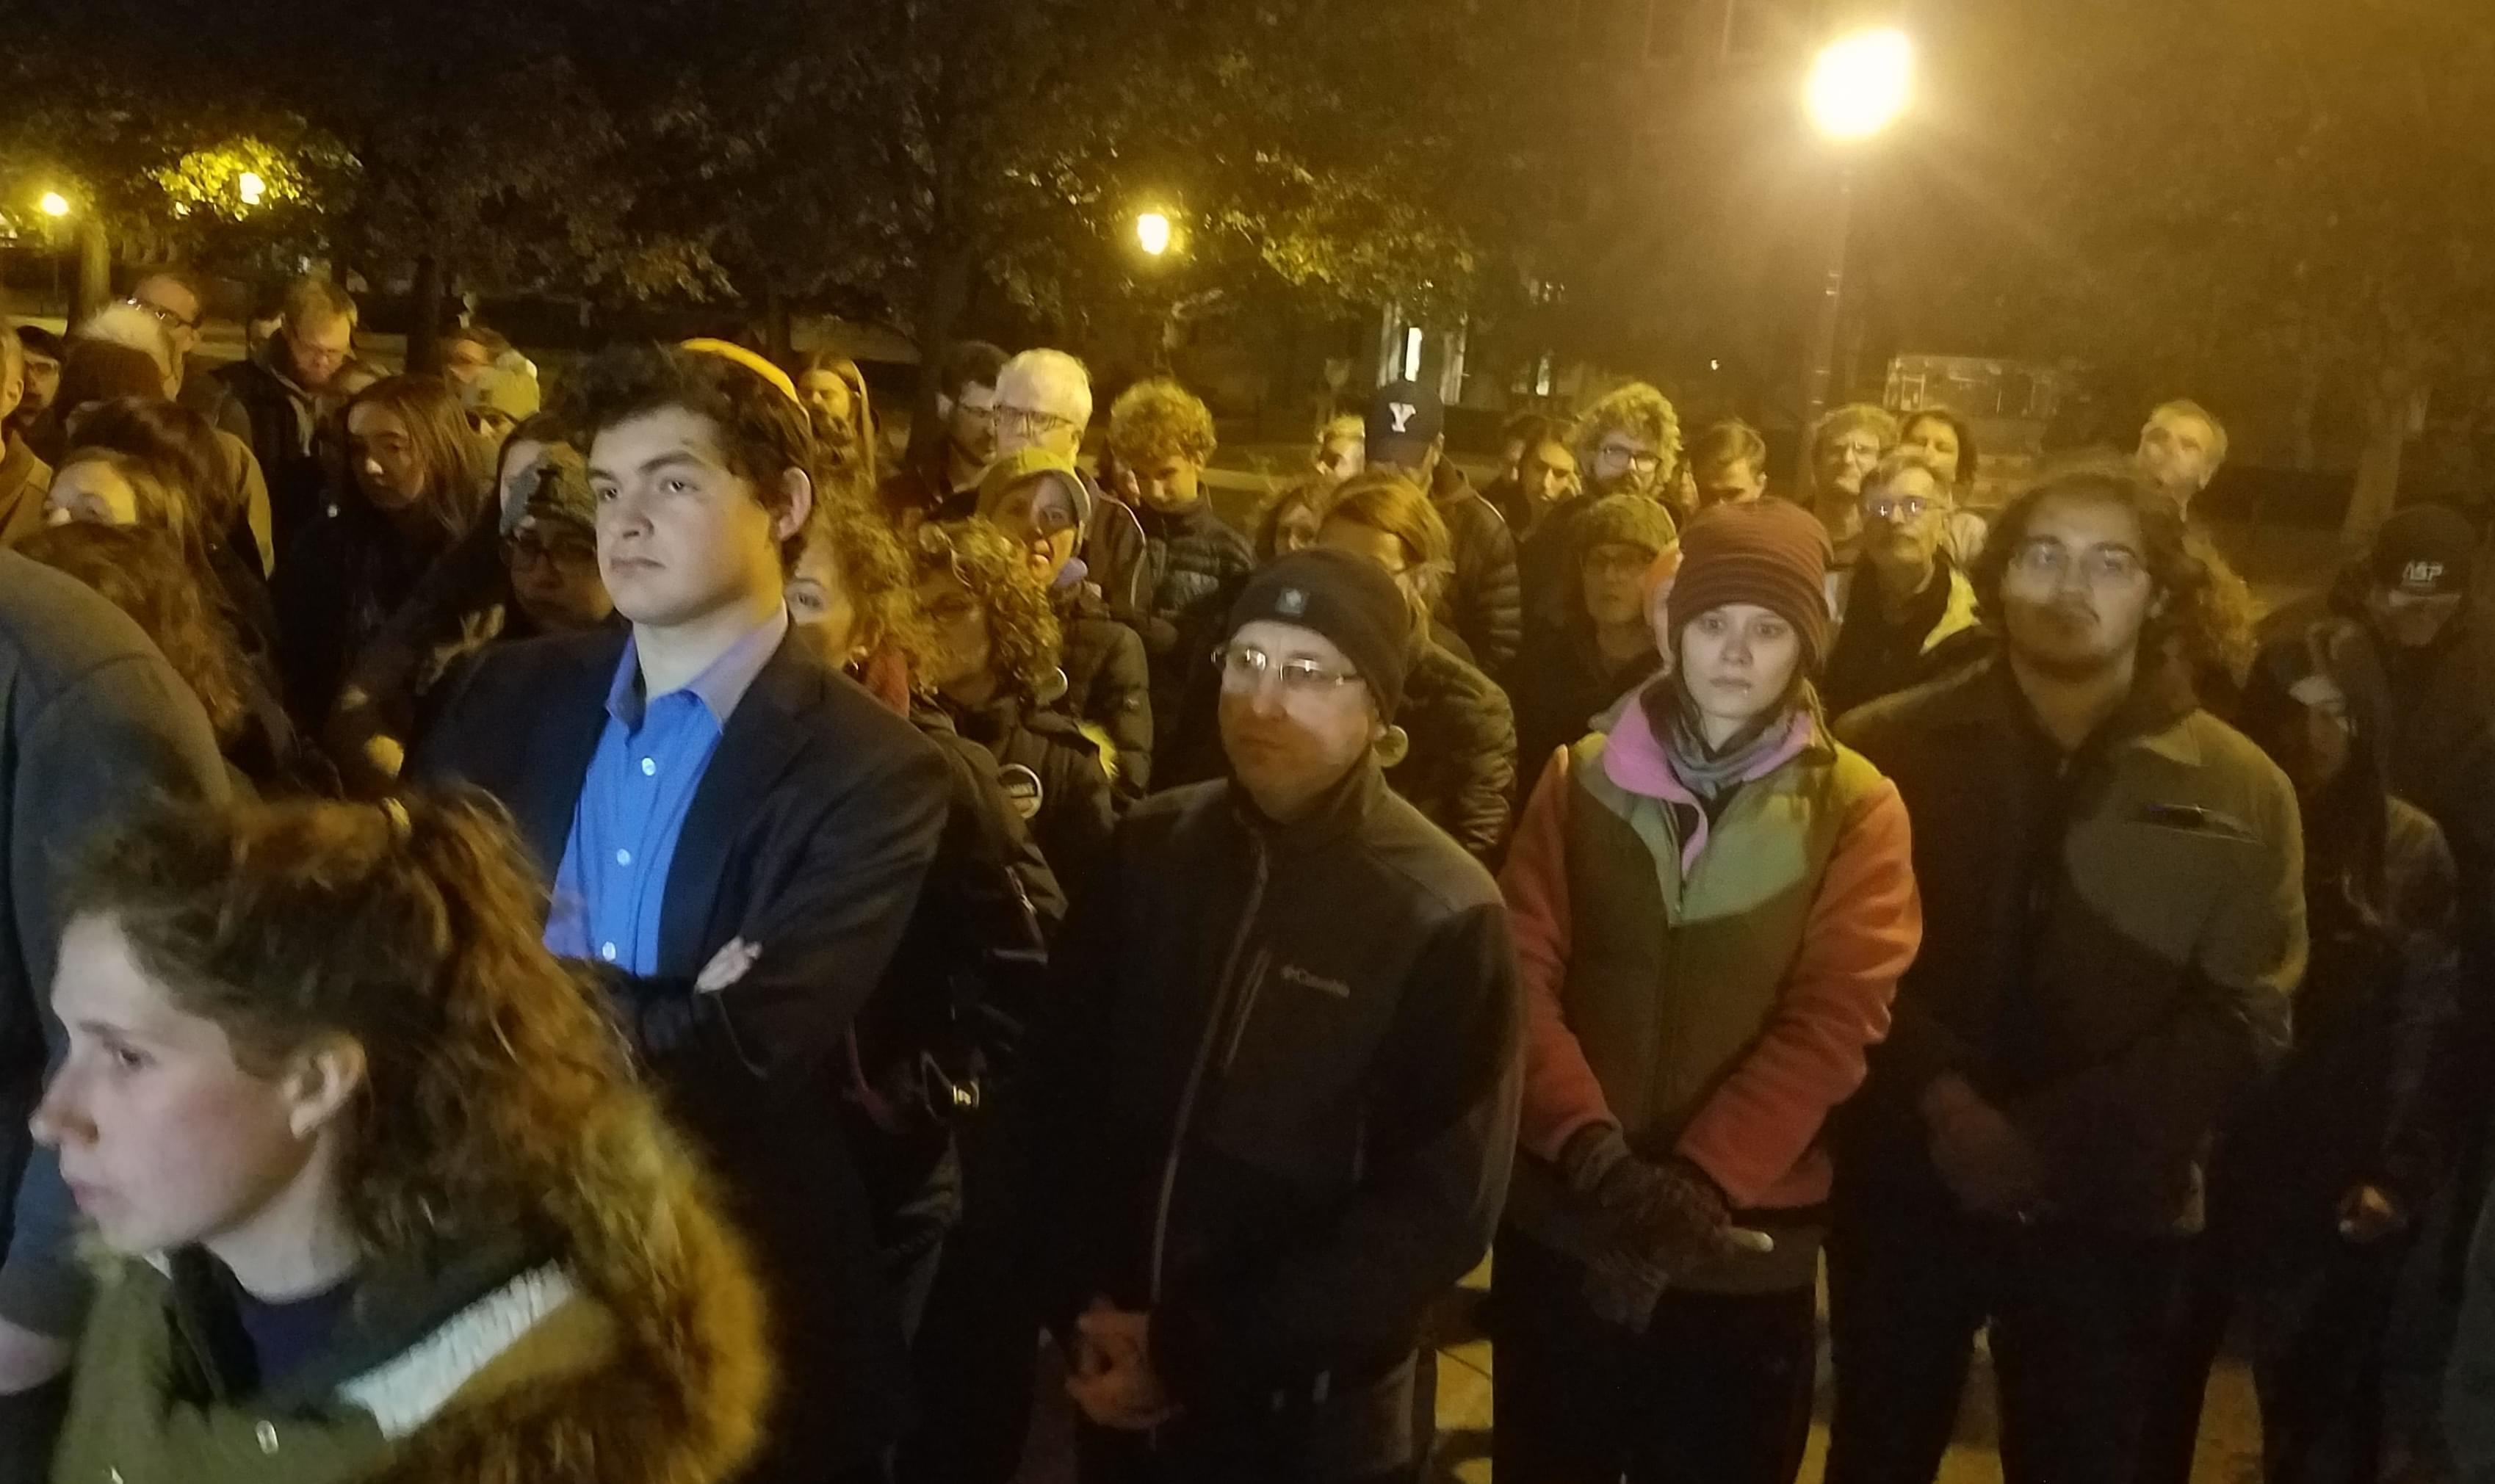 Vigil at University  of Illinois for Pittsburgh synagogue shooting victims.